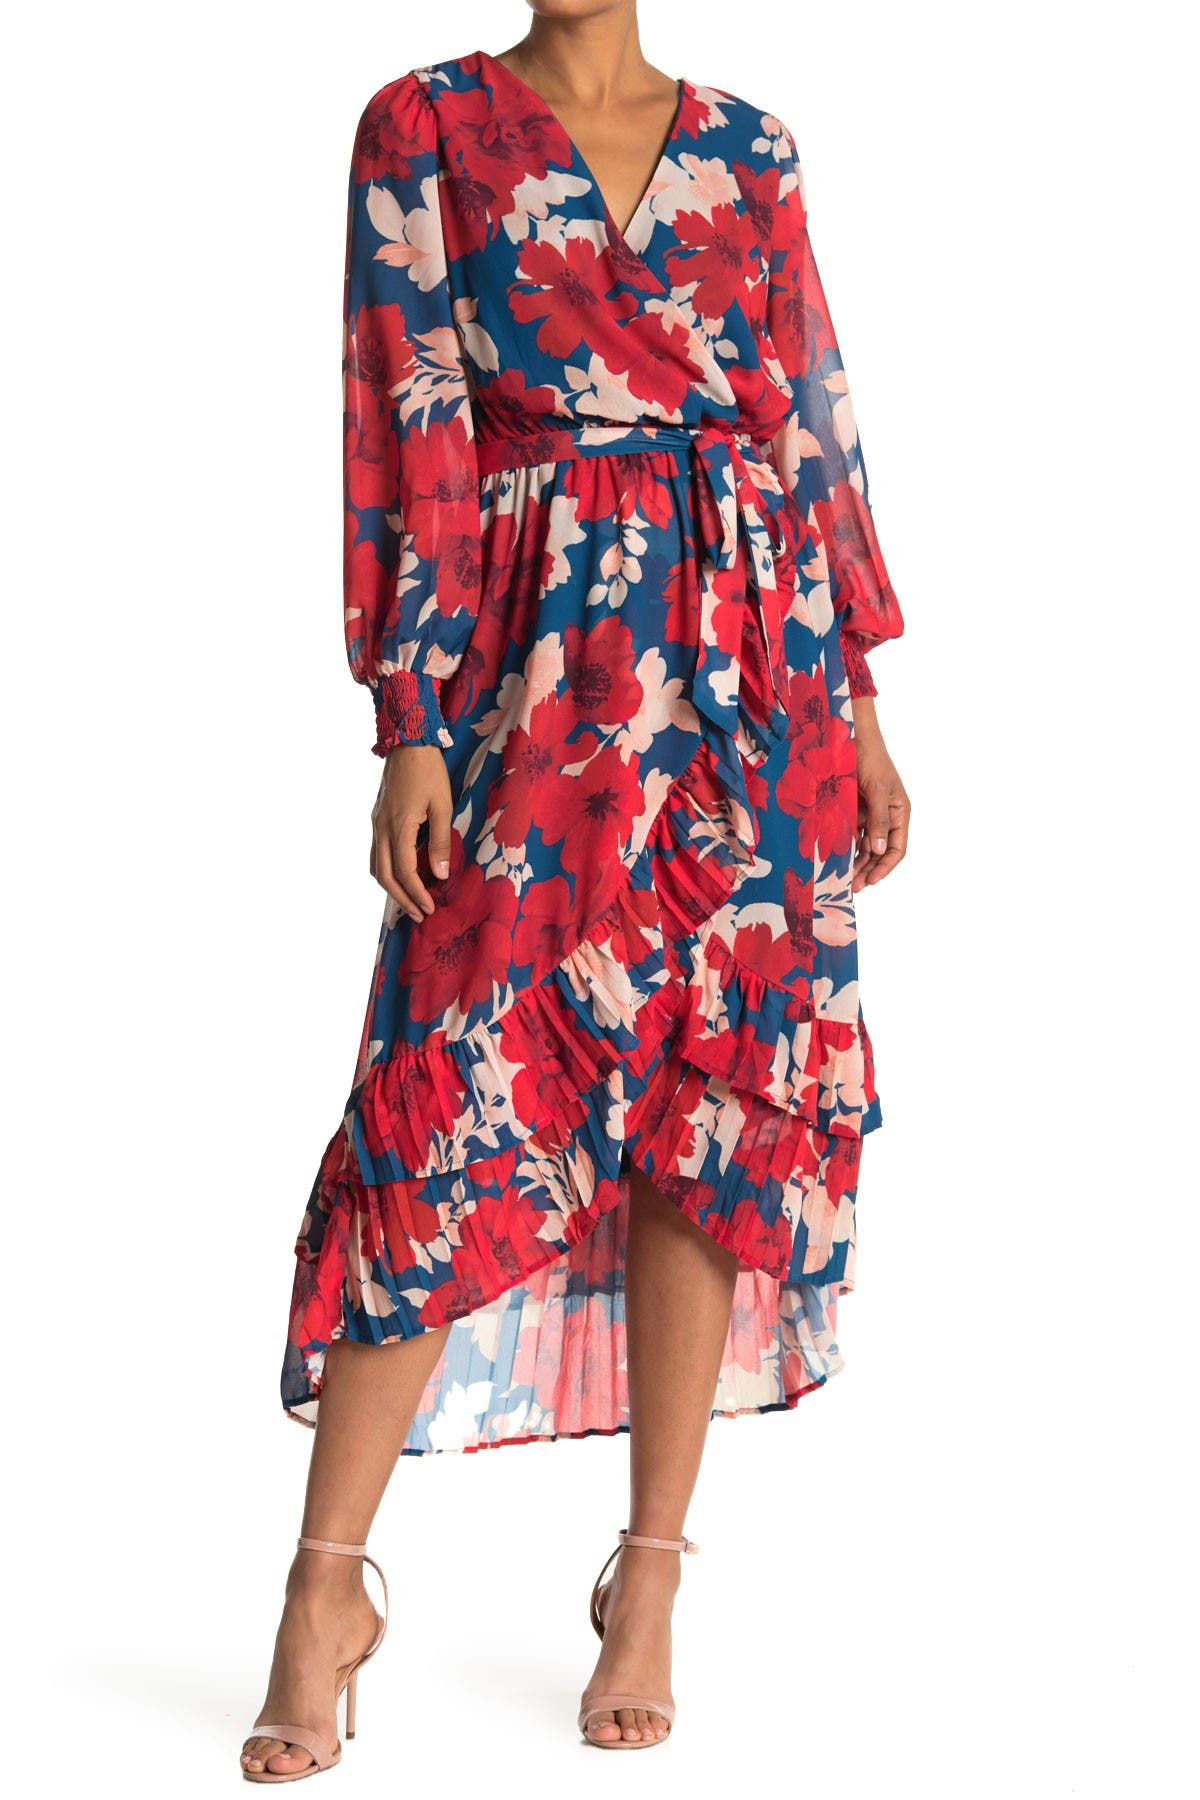 Image of A.Calin Floral Long Sleeve Midi Wrap Dress